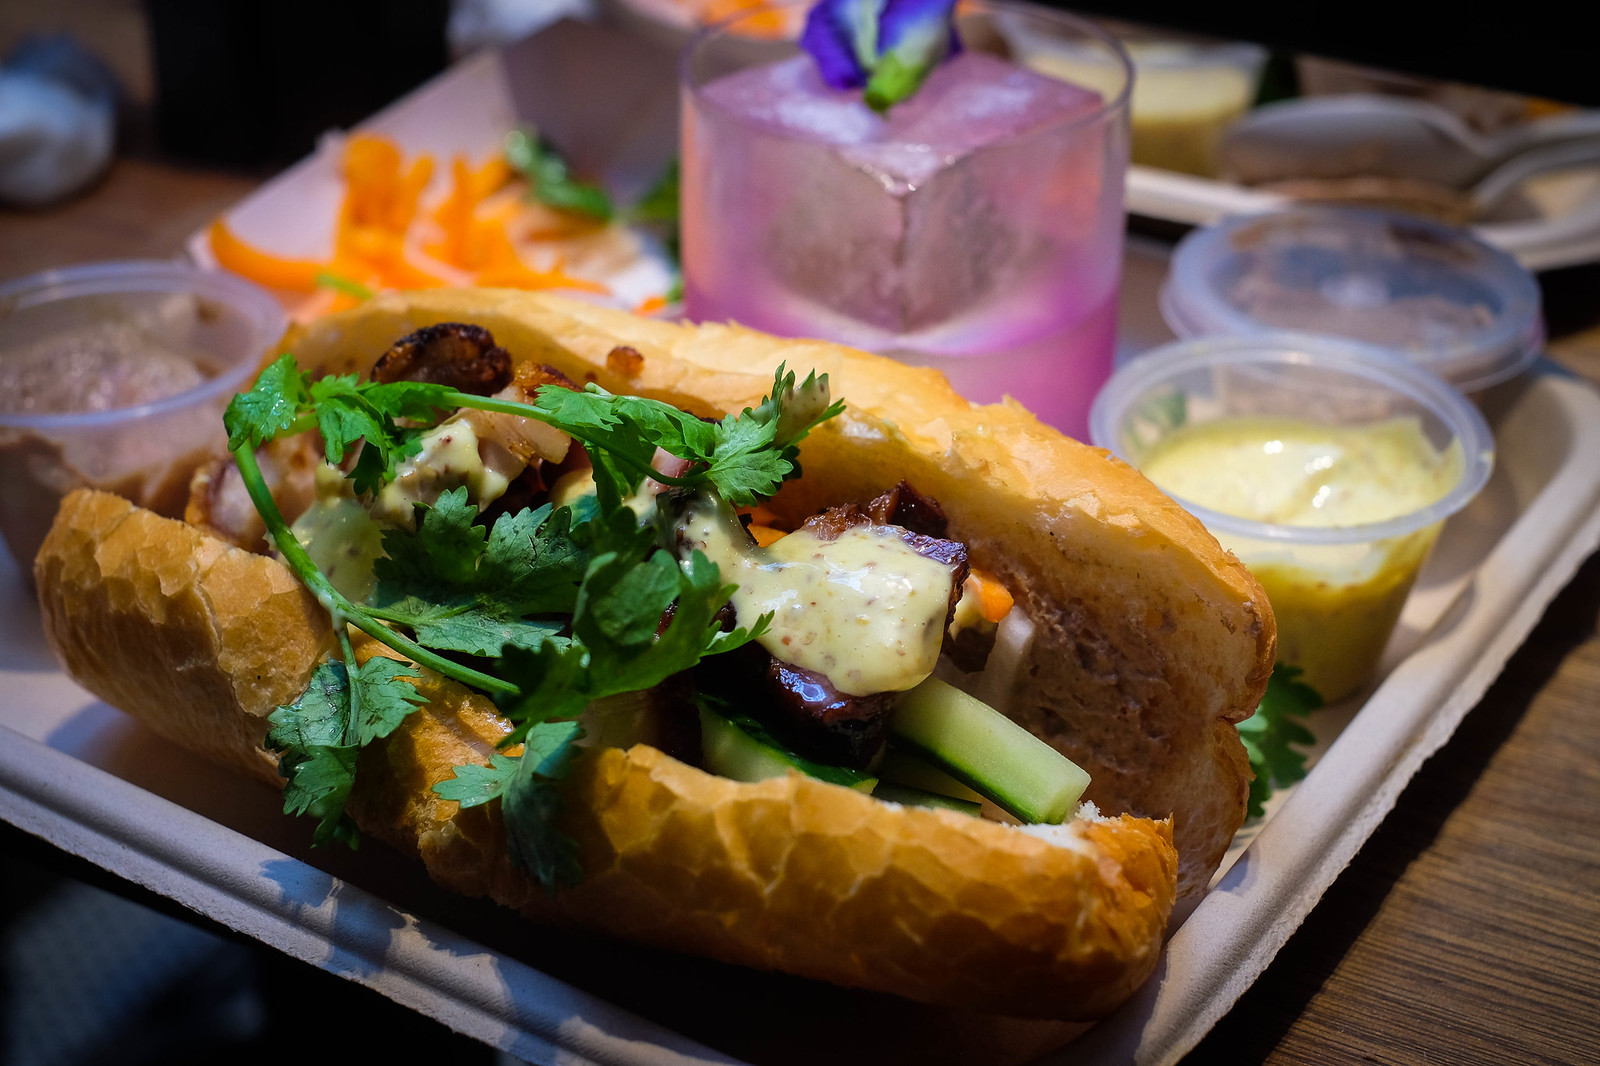 Singapore Food Festival 2018 DSCF3464